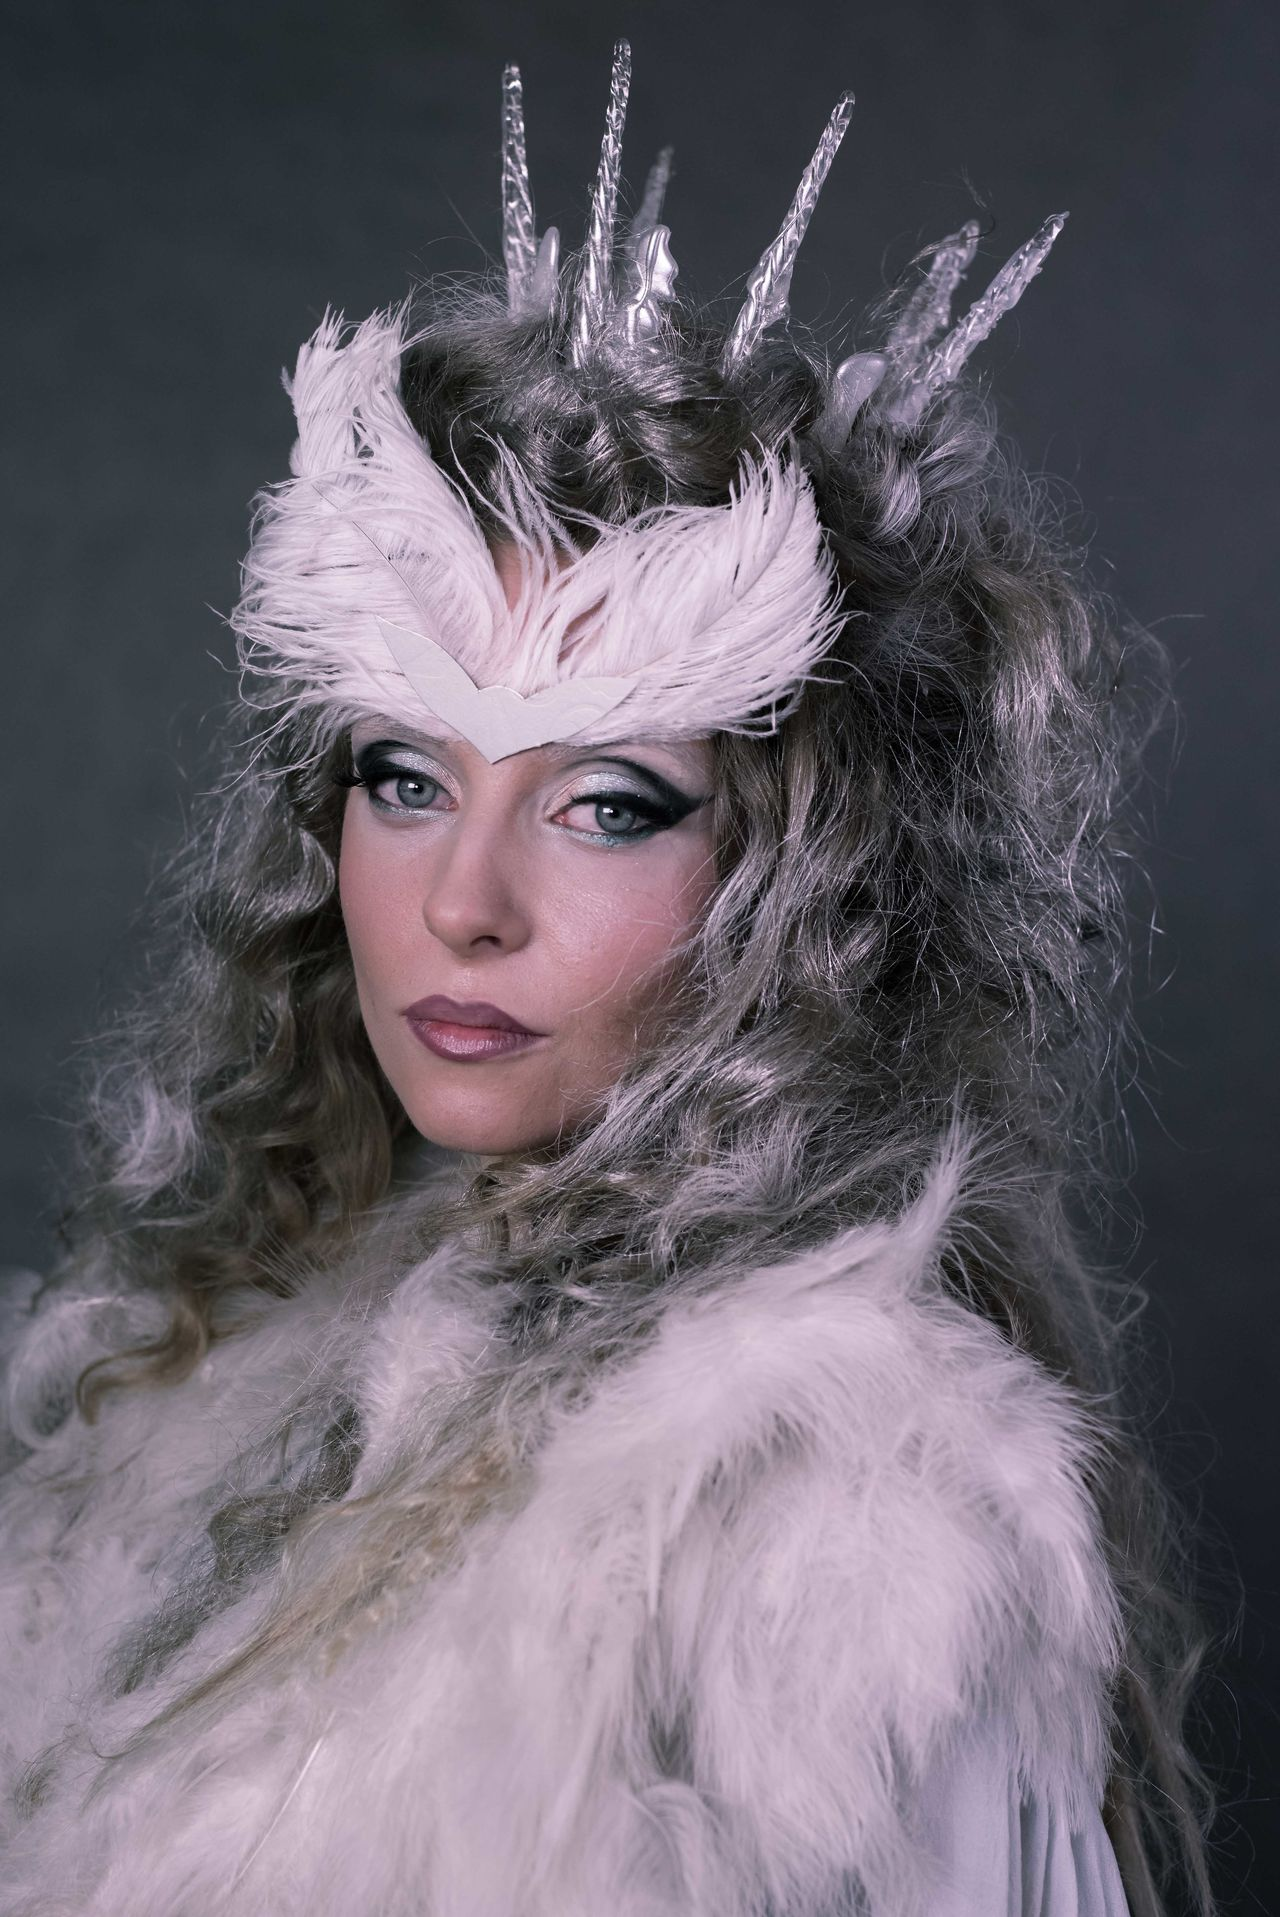 Snowqueen Makeup Makeupartist Makeup Artist Beautiful Woman Adults Only Portrait Beautiful People Studio Shot Adult